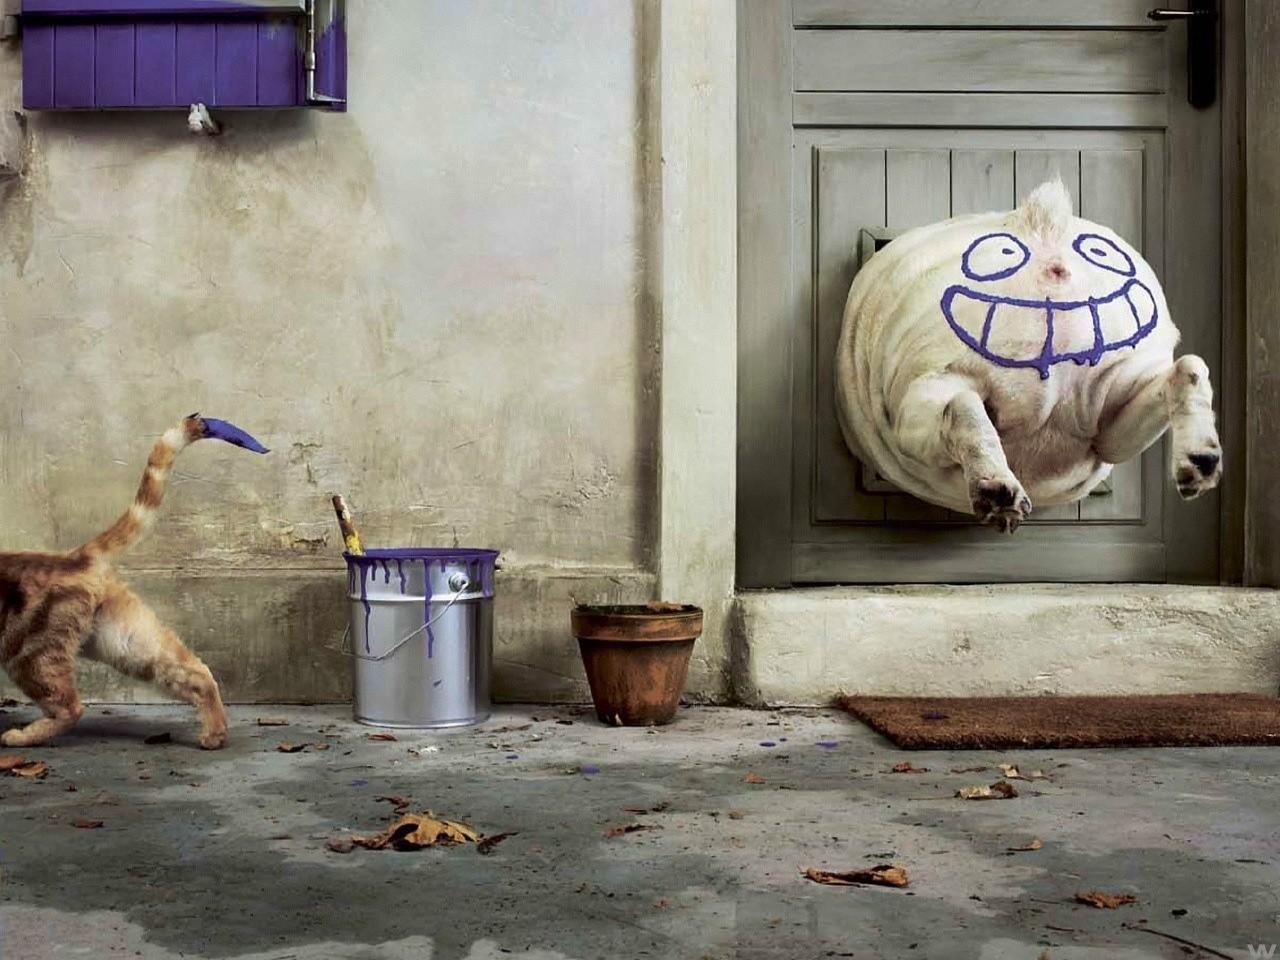 General 1280x960 animals door dog cats paint splatter smiling smiley paint can